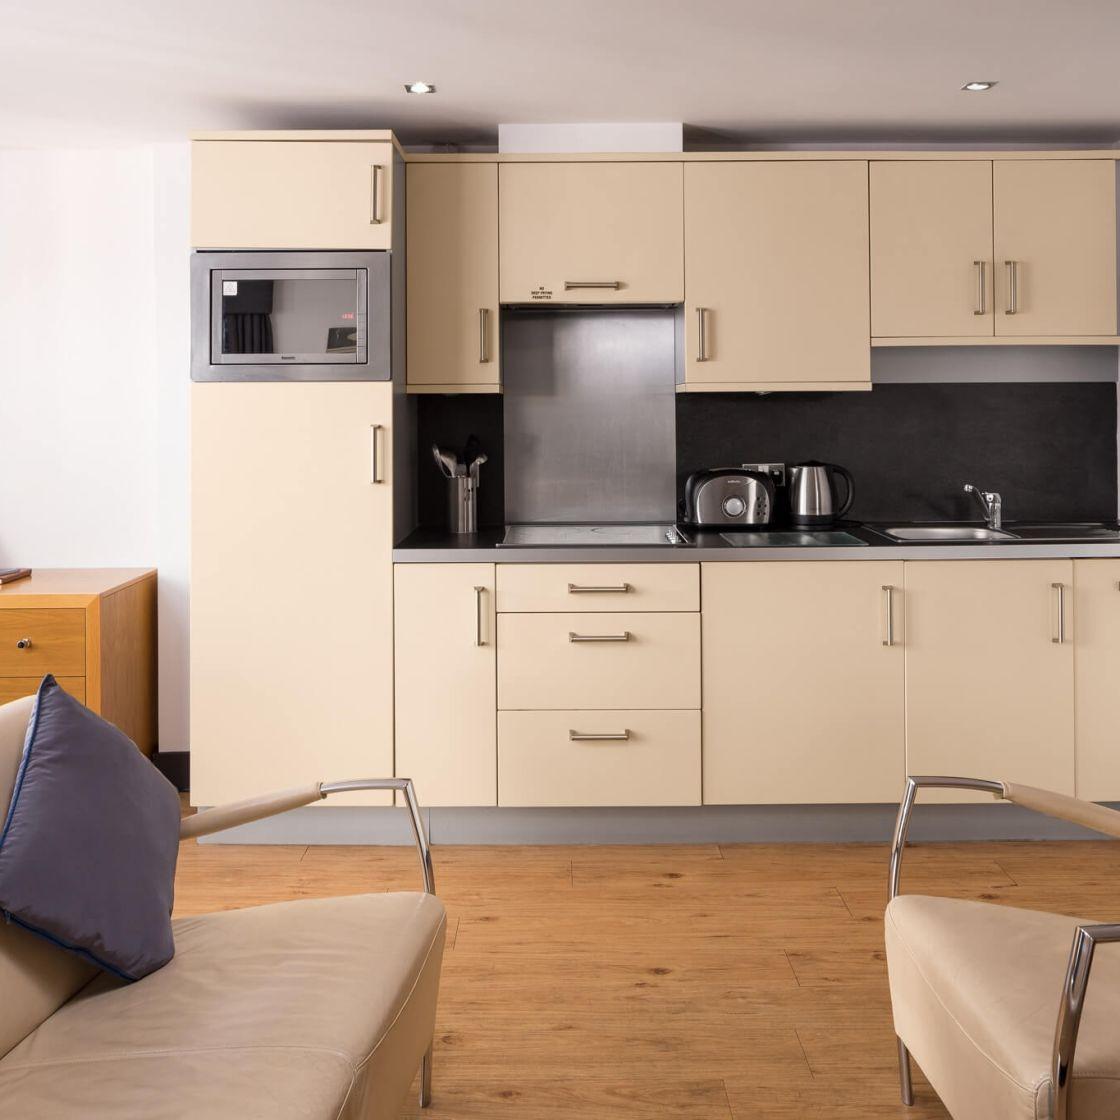 Smart Studio Student Apartment in Leeds. Kitchen and living area. IconInc @ Roomzzz Leeds City Wet